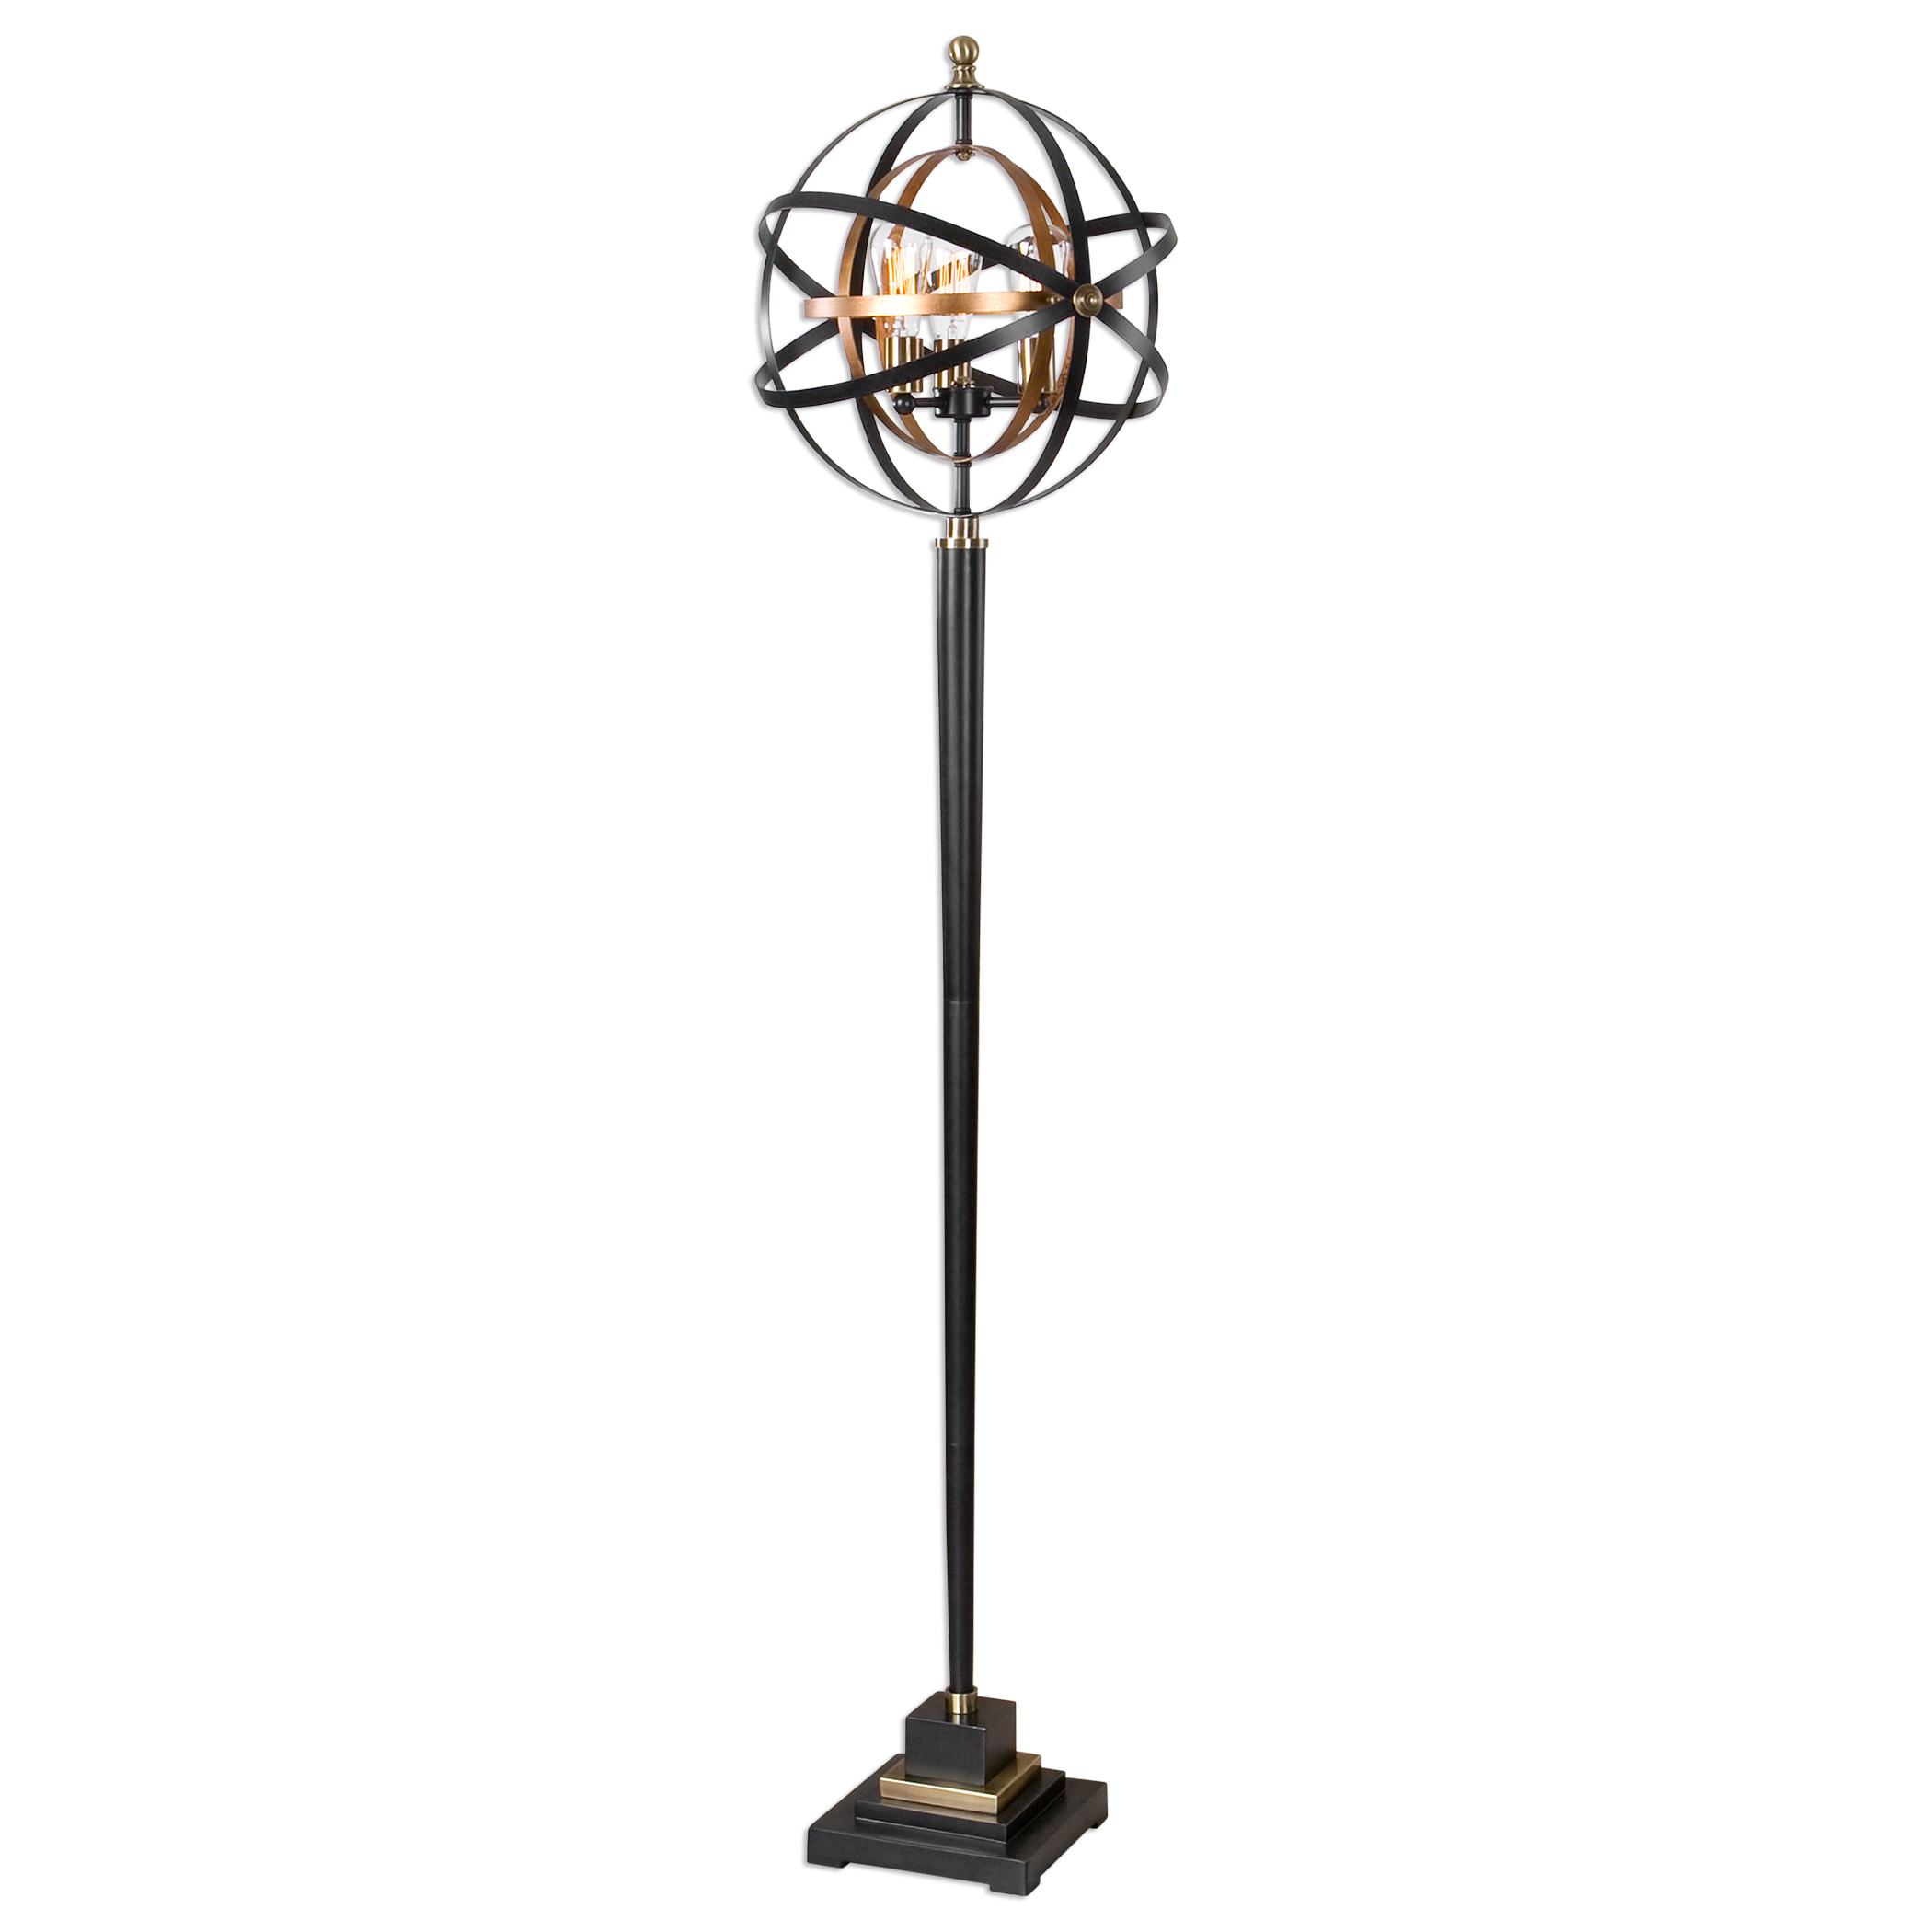 Floor Lamps Rondure Sphere Floor Lamp at Bennett's Furniture and Mattresses